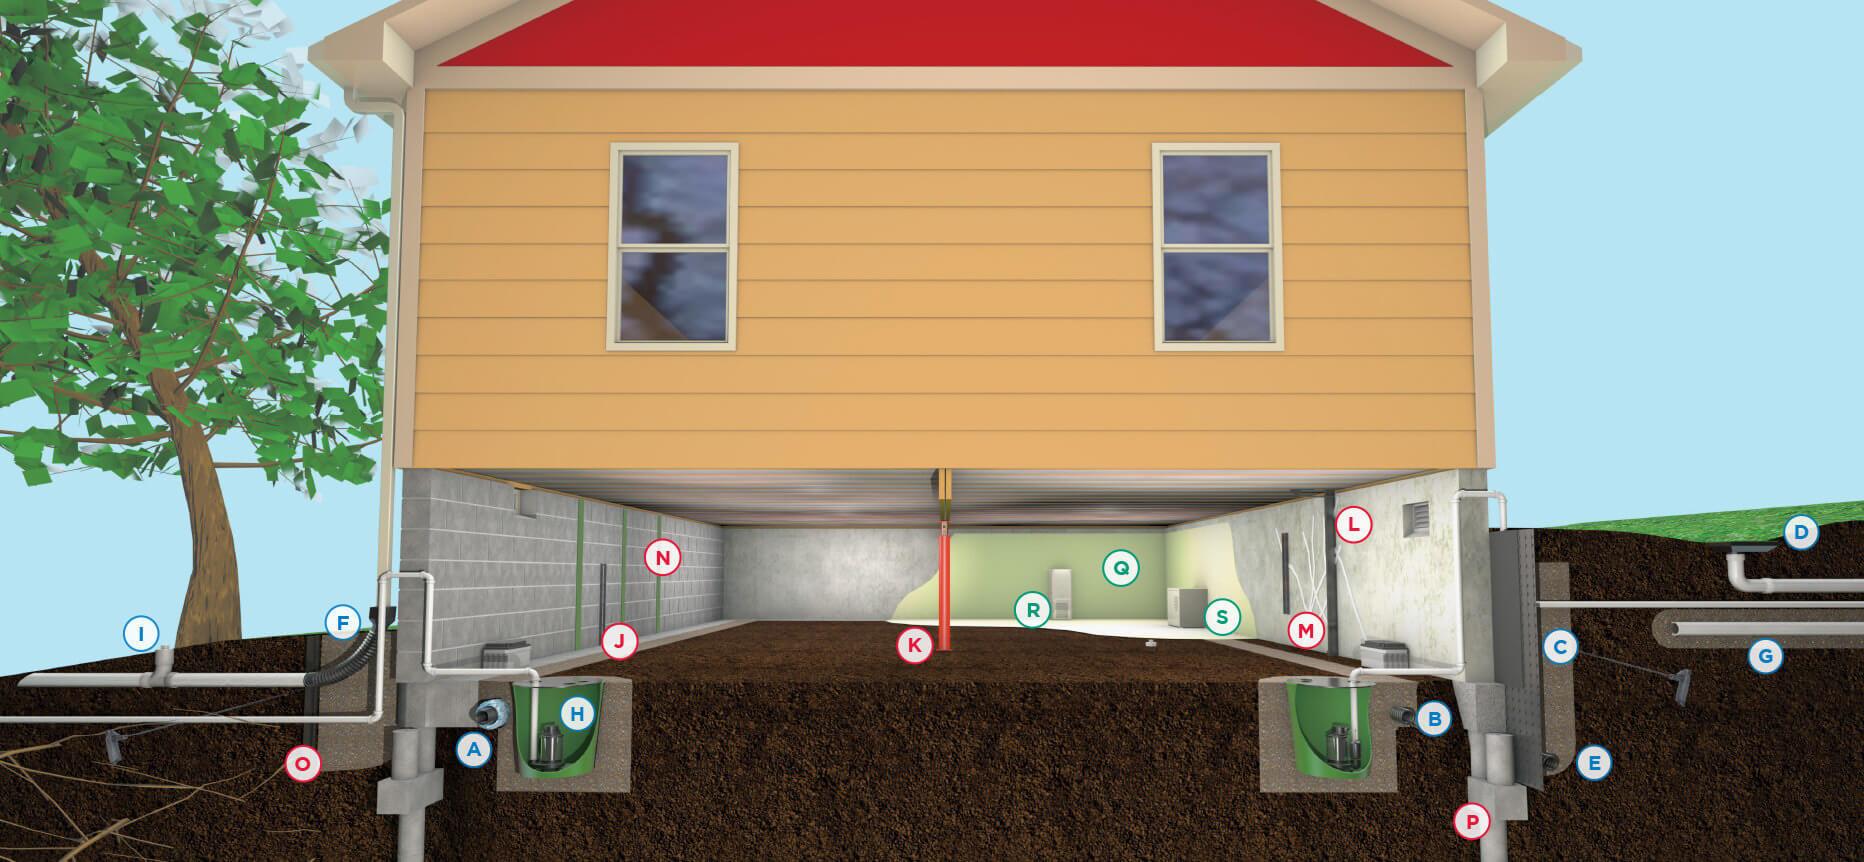 Crawl Space Encapsulation Nashville Tn Vapor Barriers